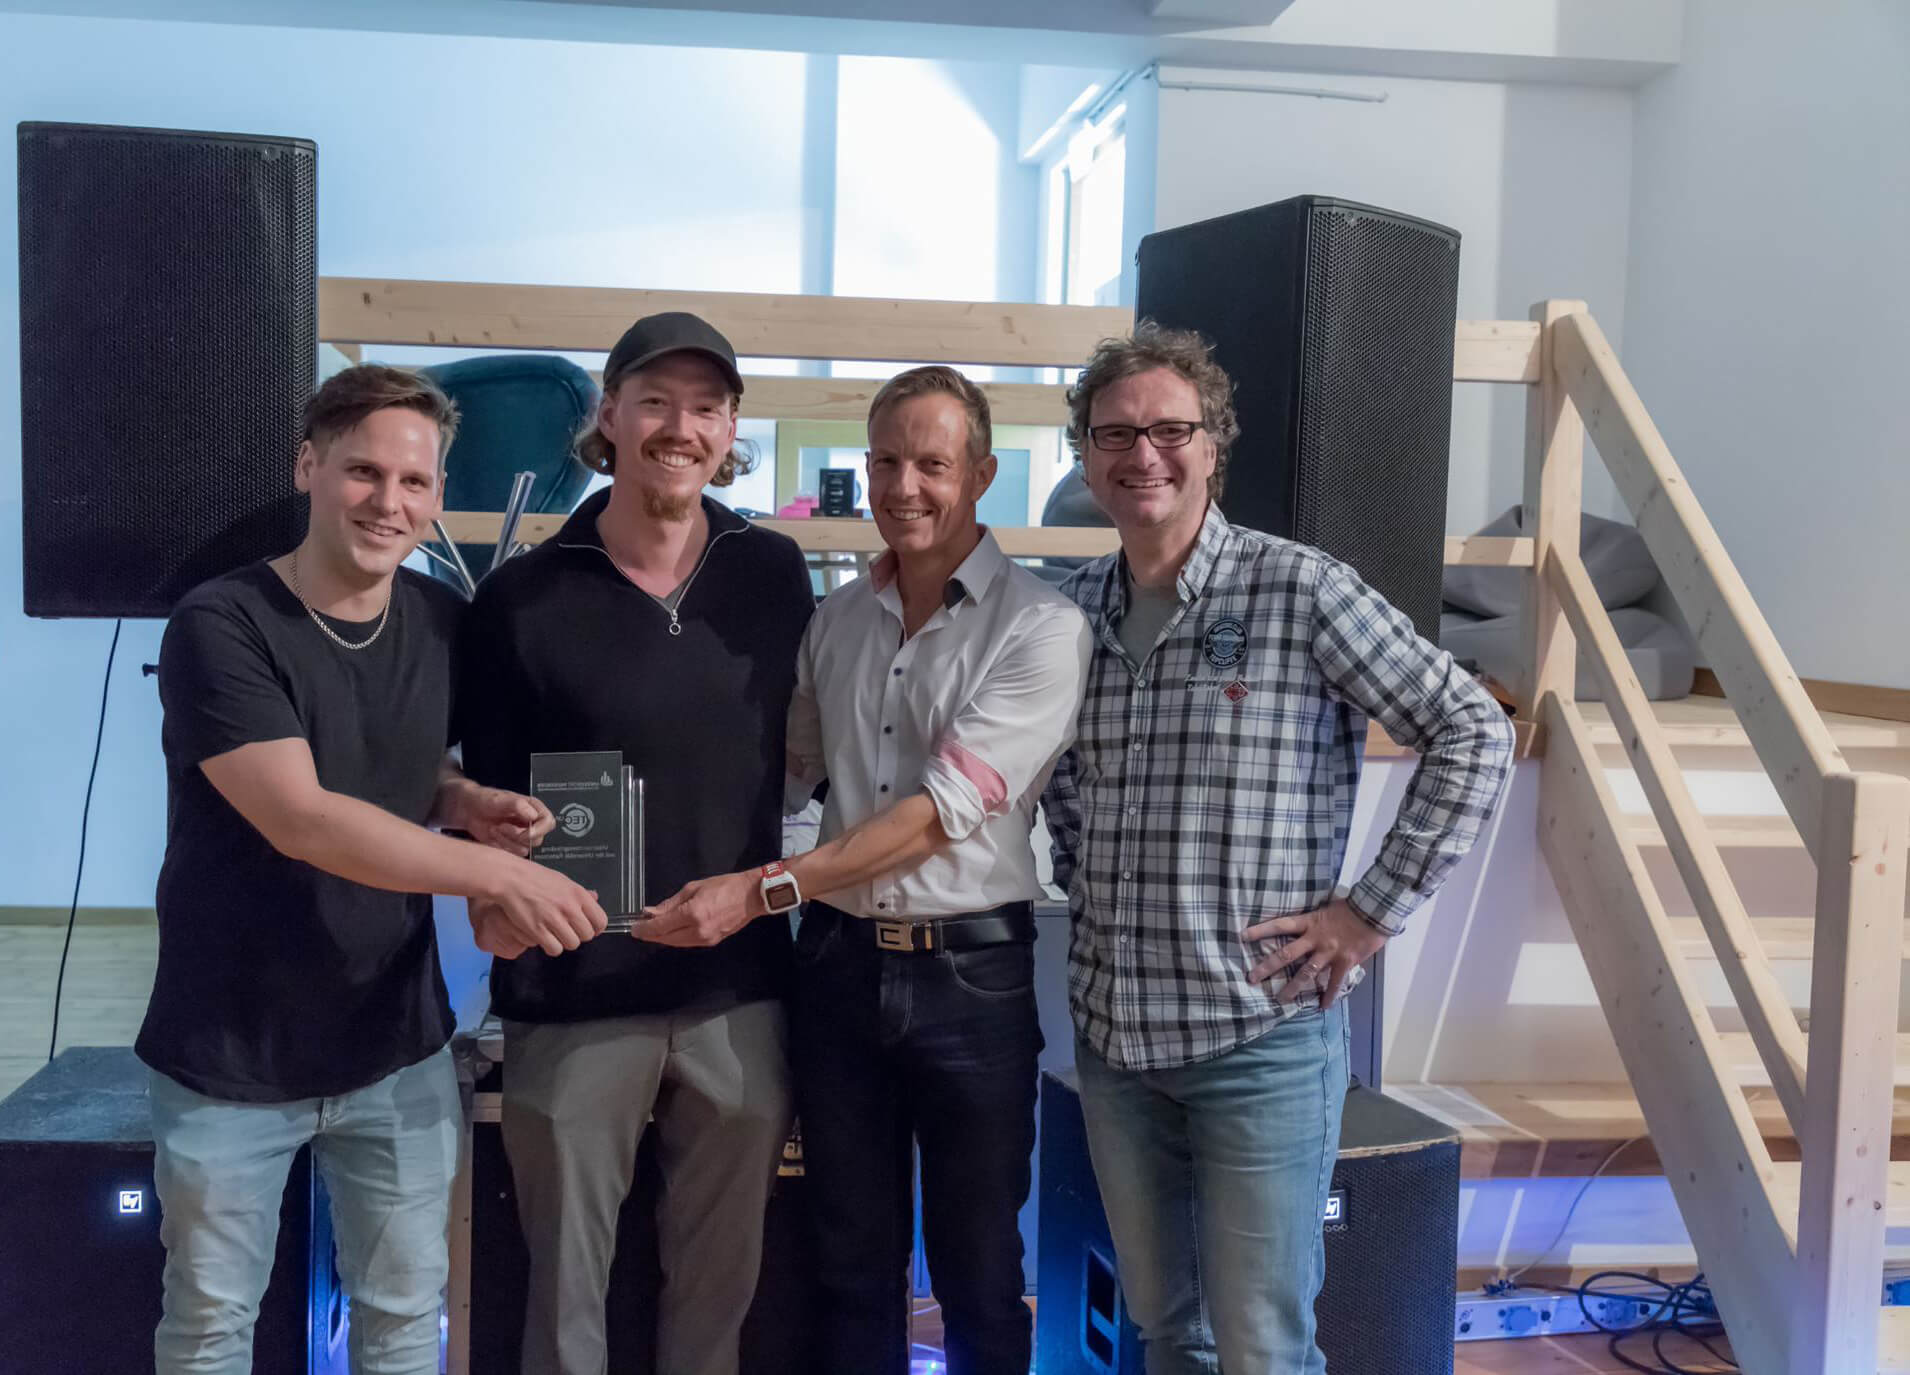 Verleihung des Qualitätslabels der Universität Paderborn an syqlo